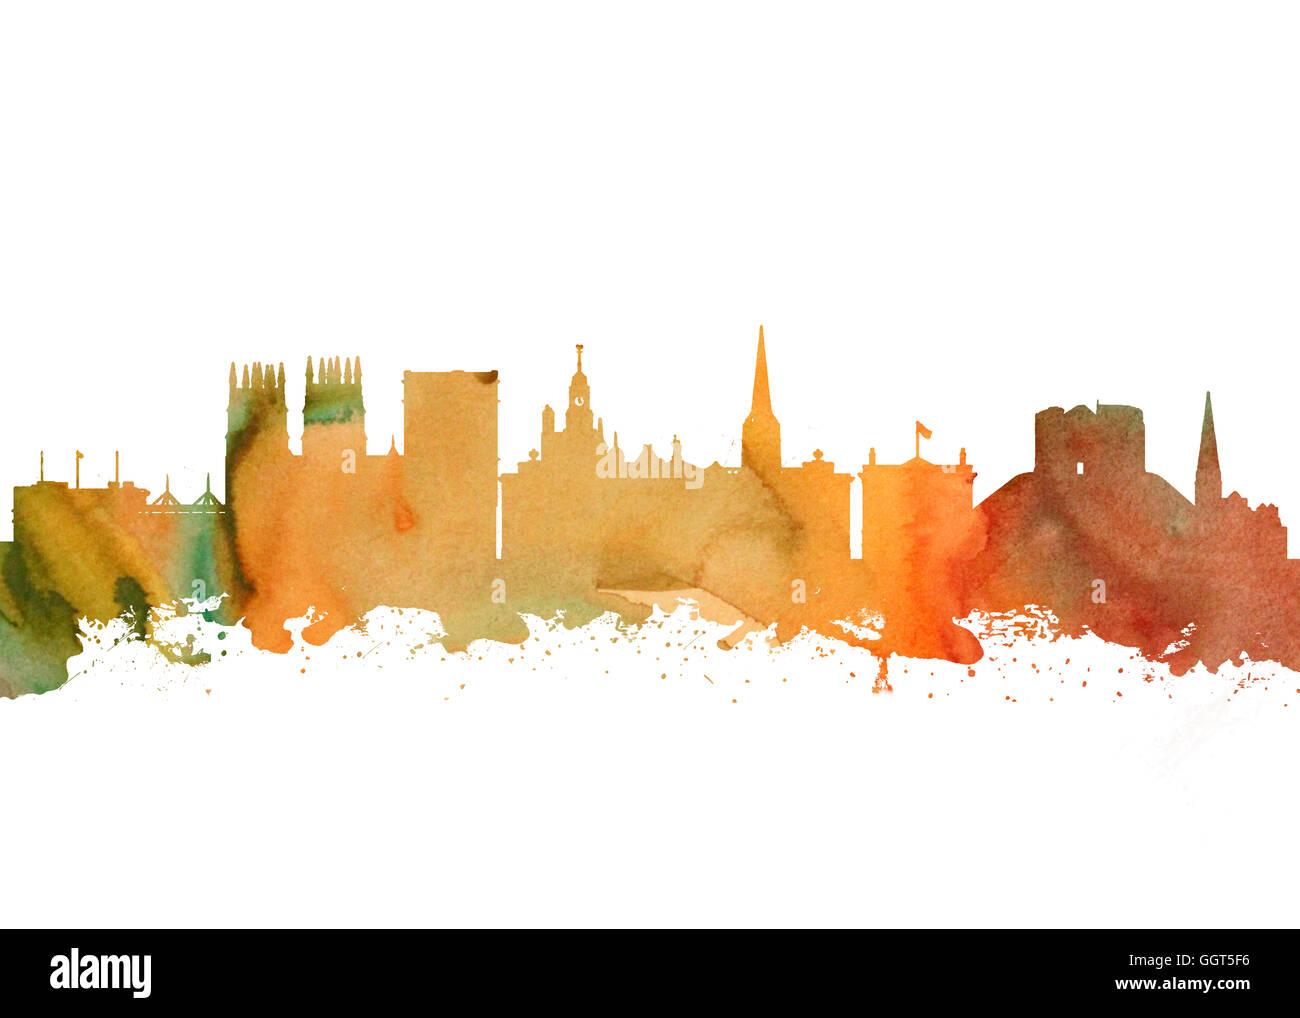 Watercolor art print of the Skyline of  York England - Stock Image